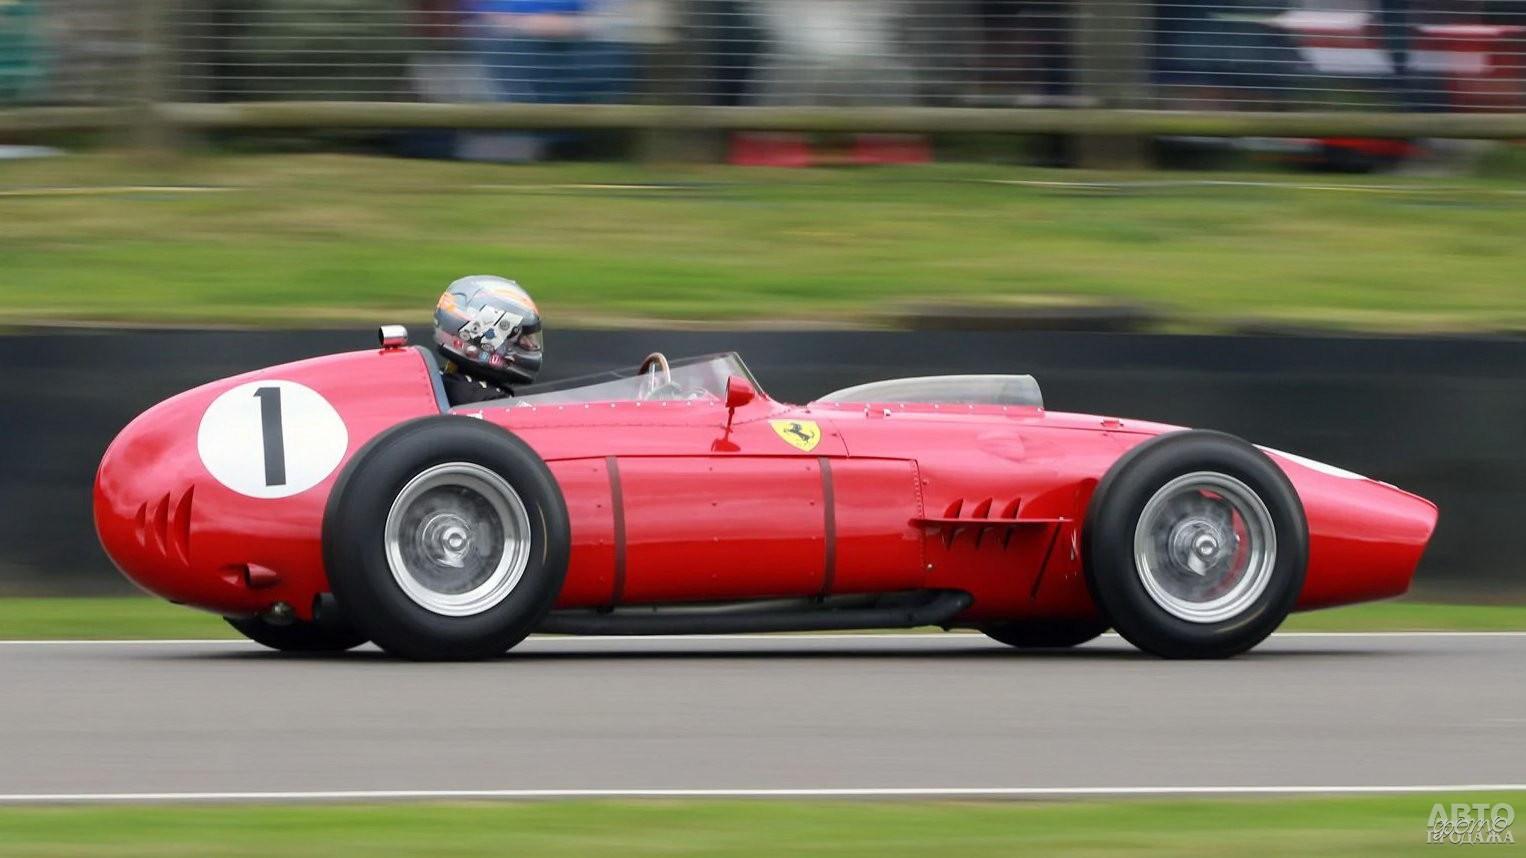 Чемпионский Ferrari 246 Dino 1958 года